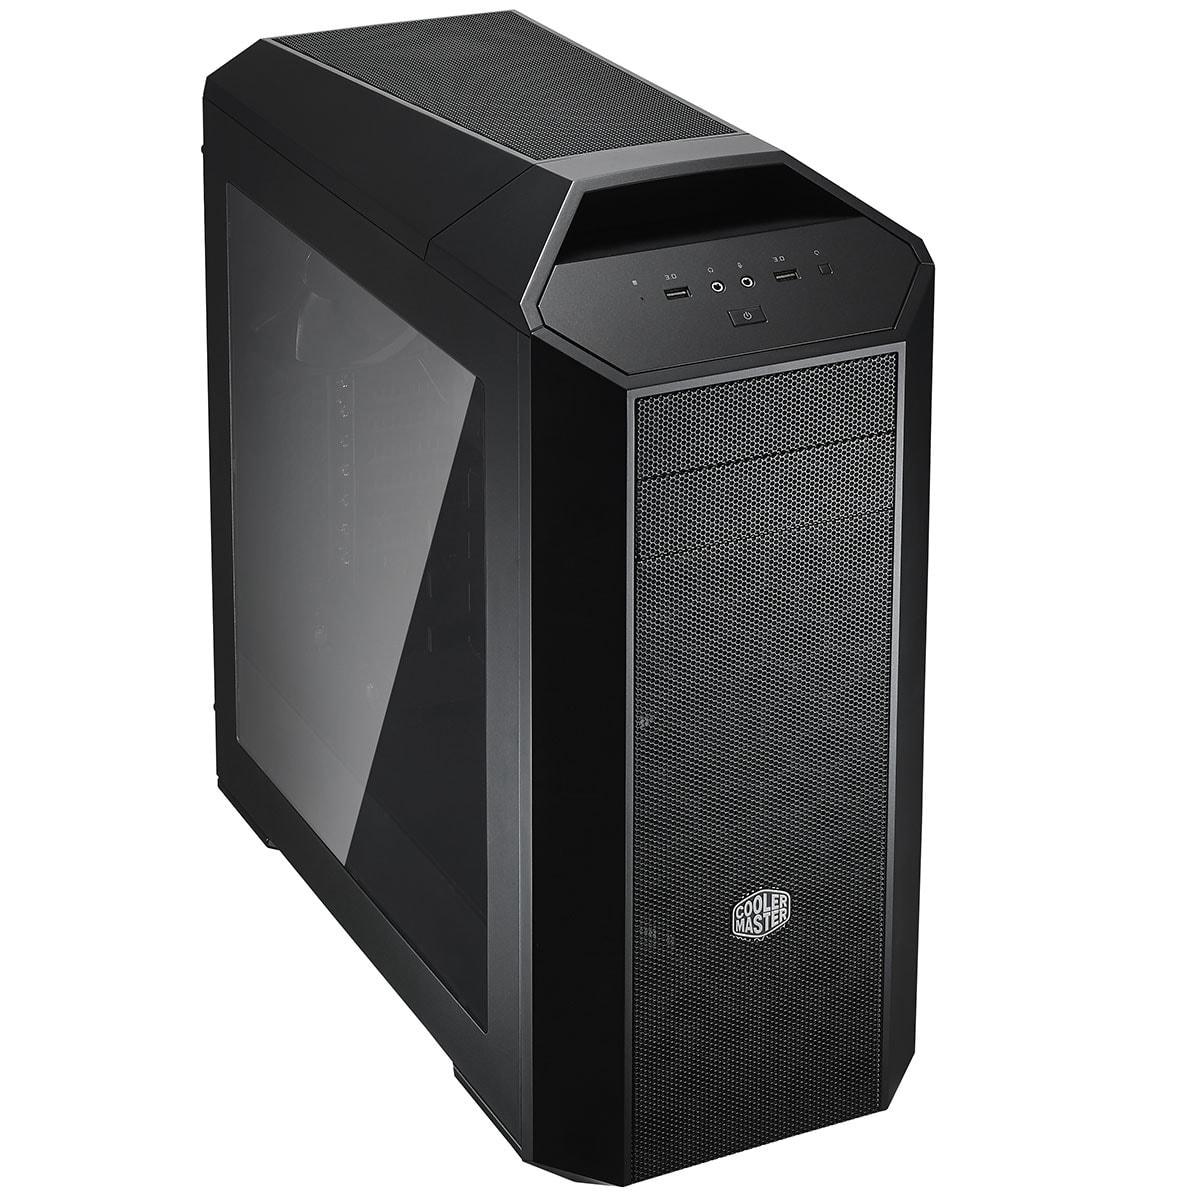 Cooler Master GT/Sans Alim/ATX Noir - Boîtier PC Cooler Master - 0